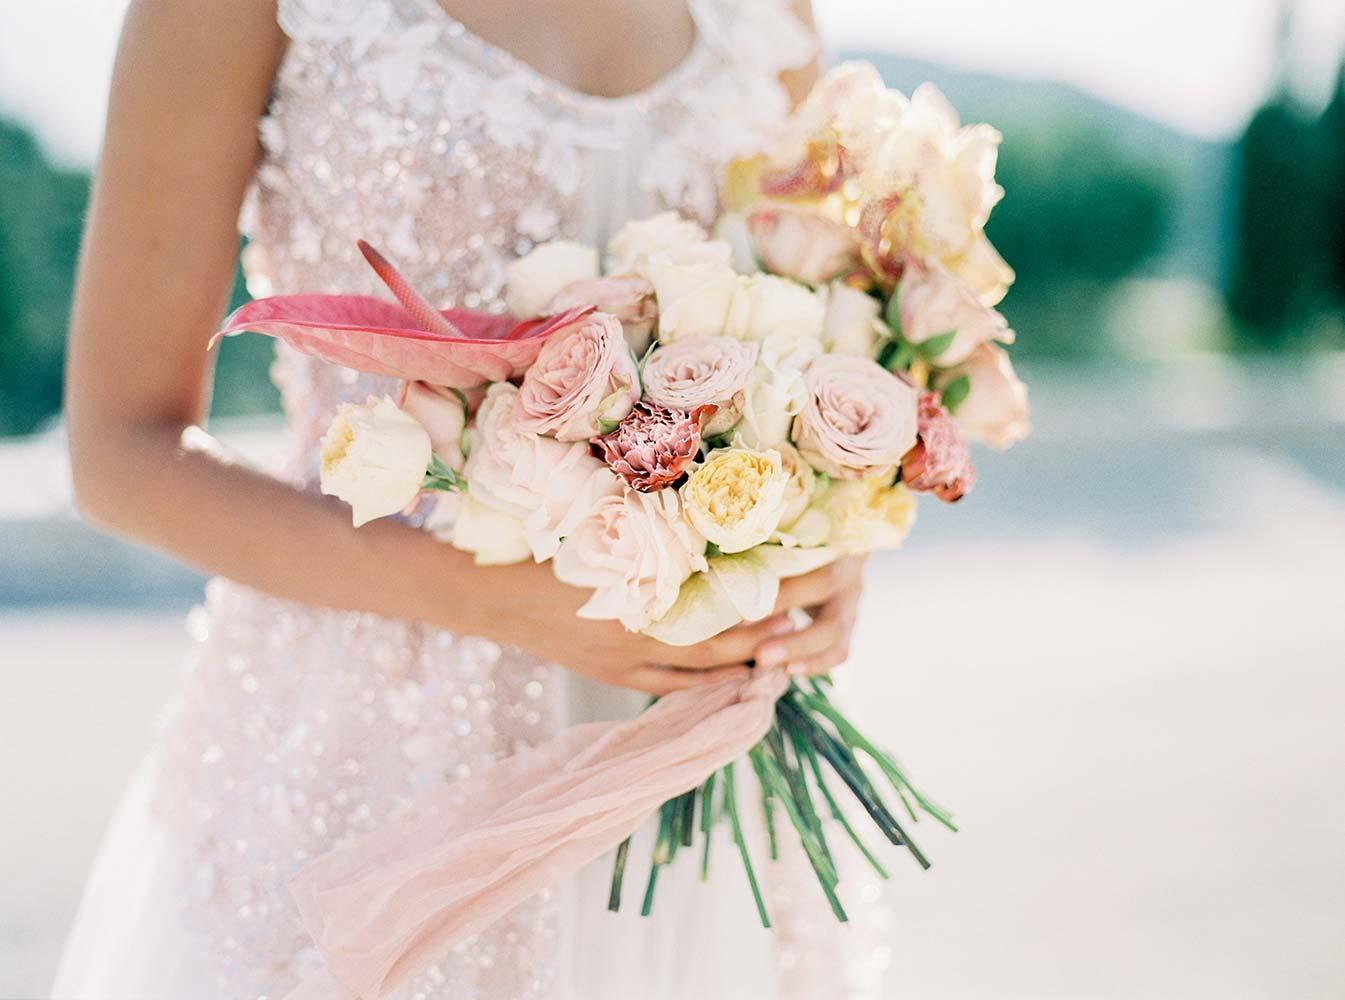 07_tomas_dolejsi_fine_art_destination_wedding_photographer